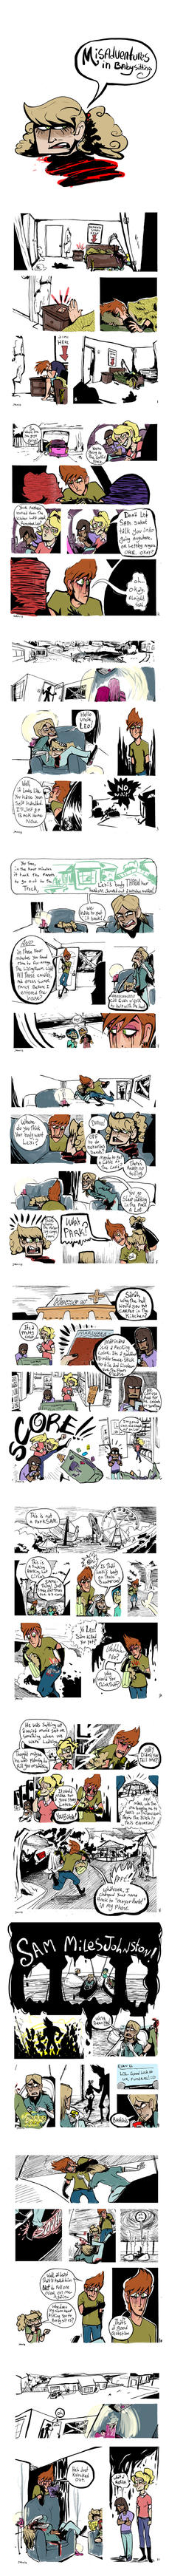 Misadventures in Babysitting by jocosejoni